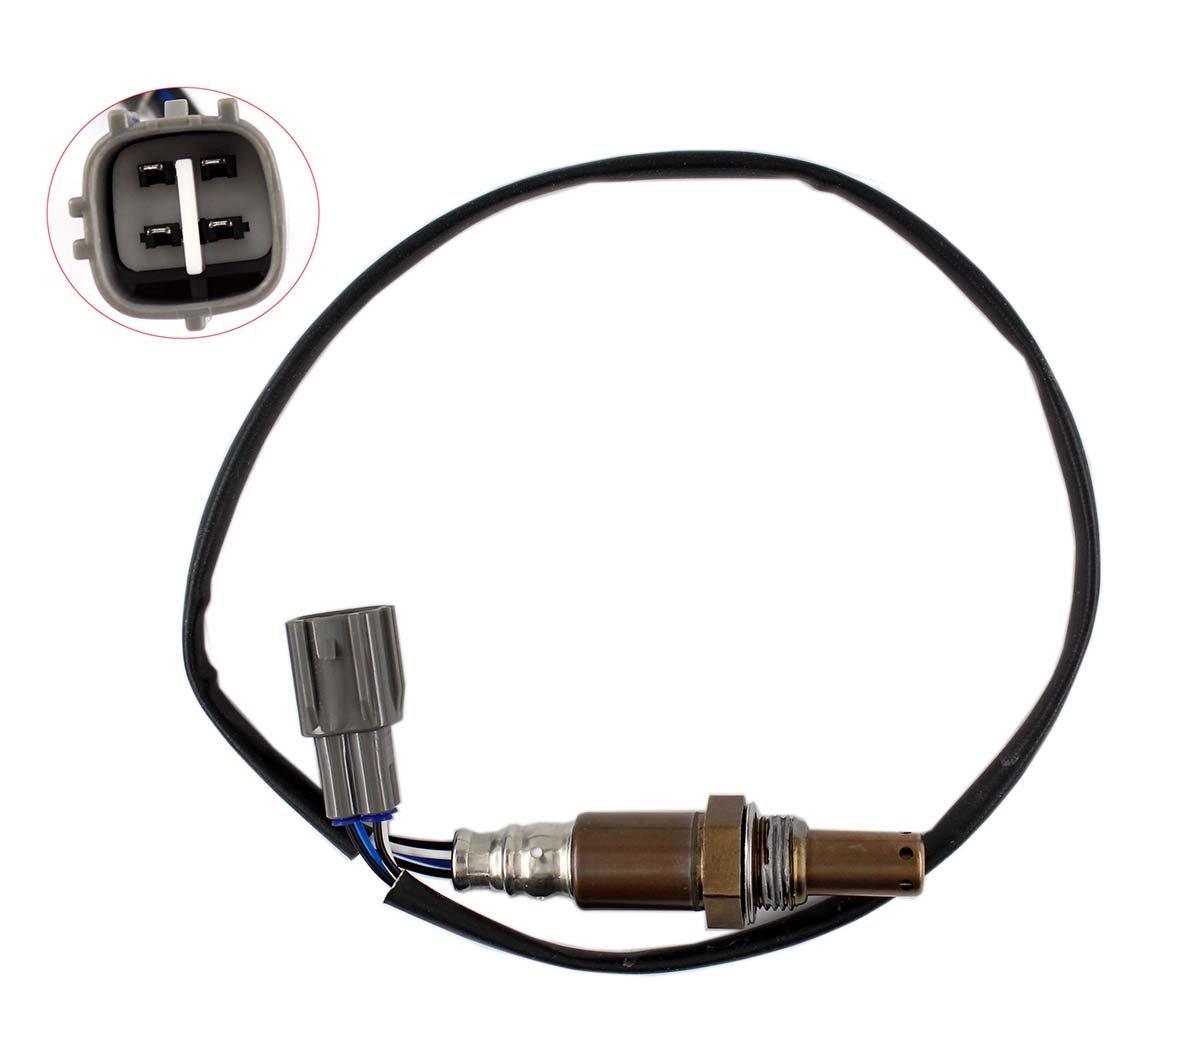 XtremeAmazing Front Upstream Air Fuel Ratio O2 Oxygen Sensor For Toyota Avalon Camry Corolla Highlander Matrix Rav4 Sienna Venza Lexus ES350 RX350 RX450h Pontiac Vibe 19184901 89467-08010 89467-0E010